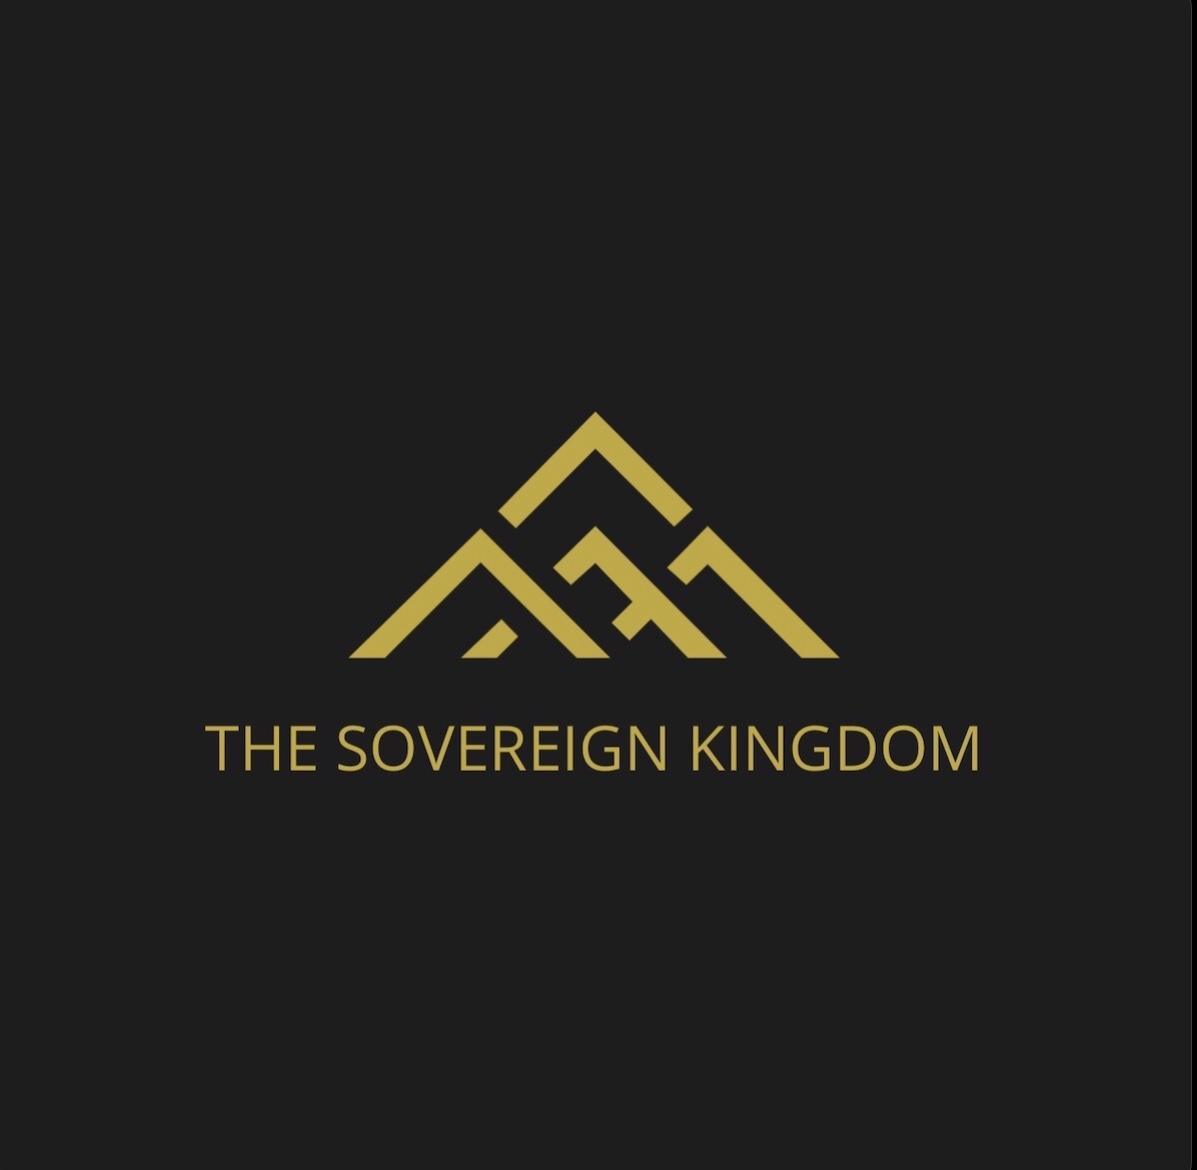 The Sovereign Kingdom